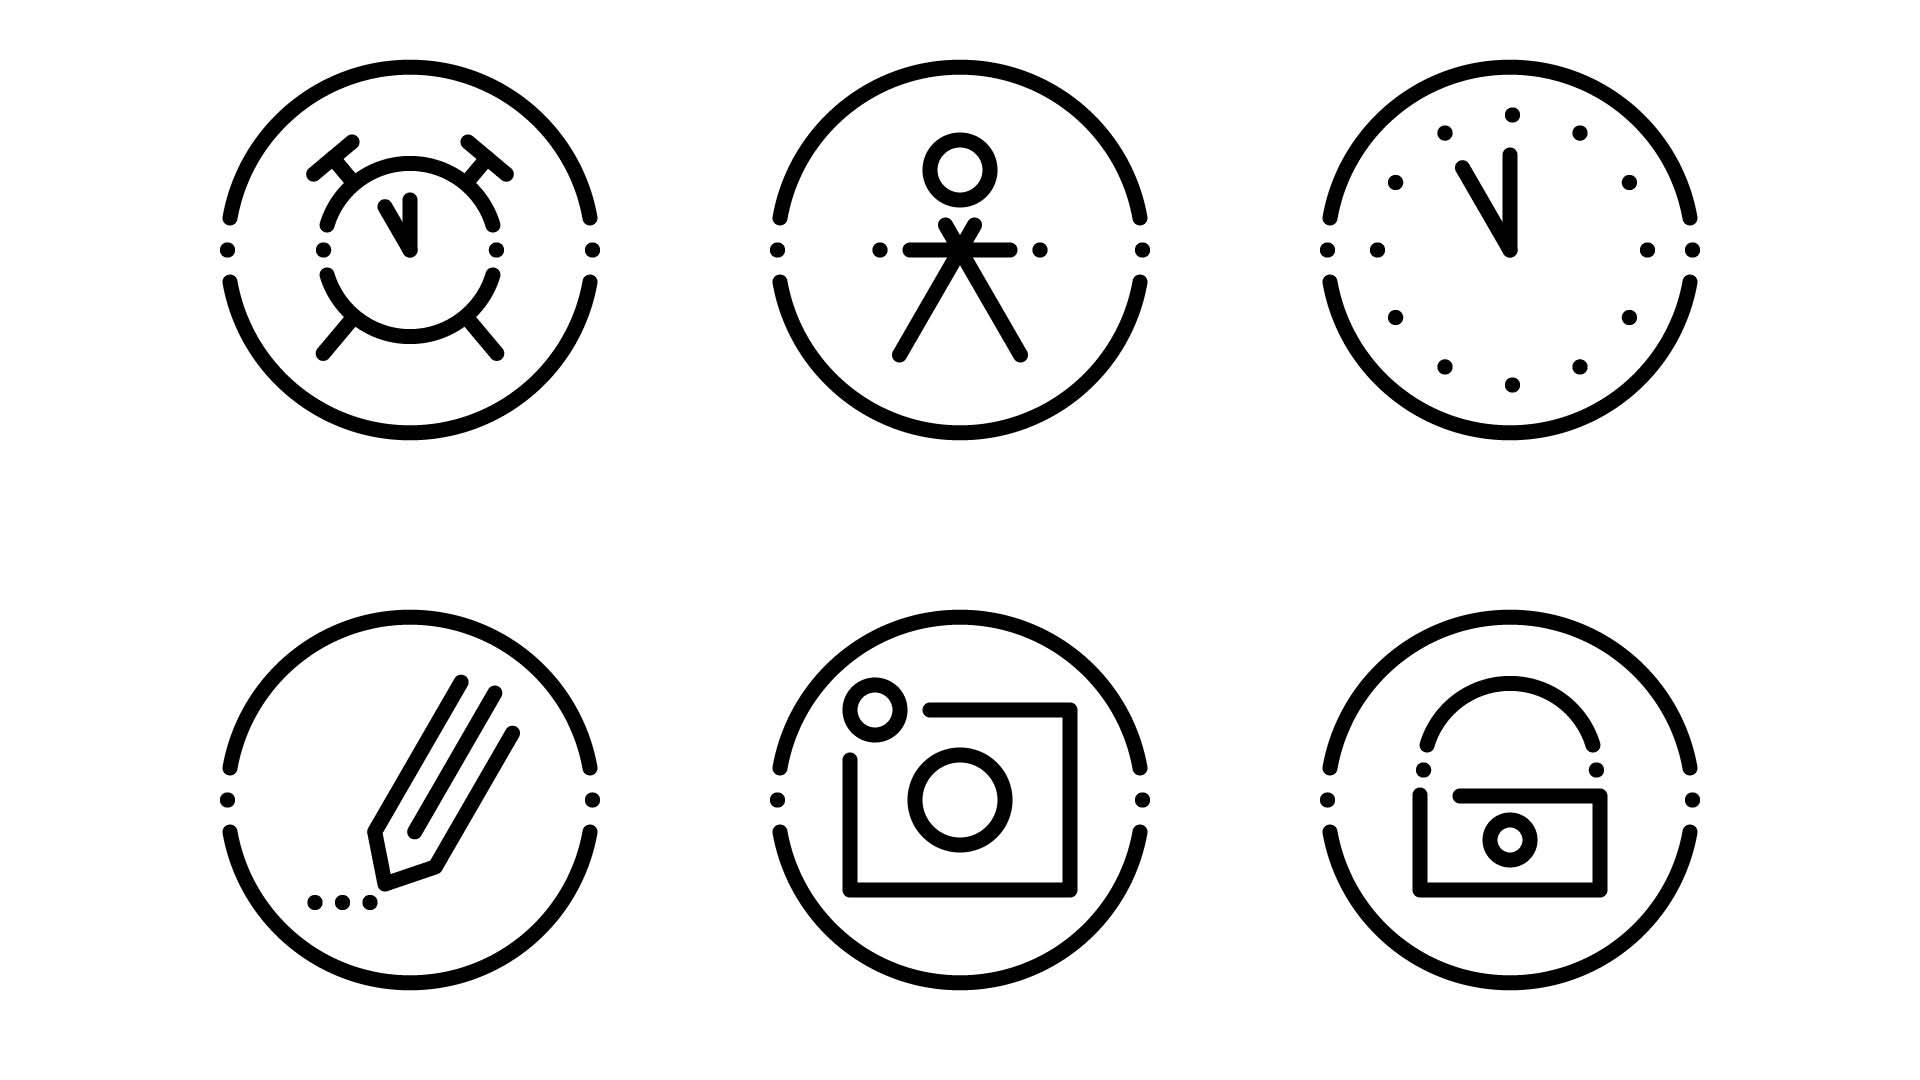 LVNZ icon design